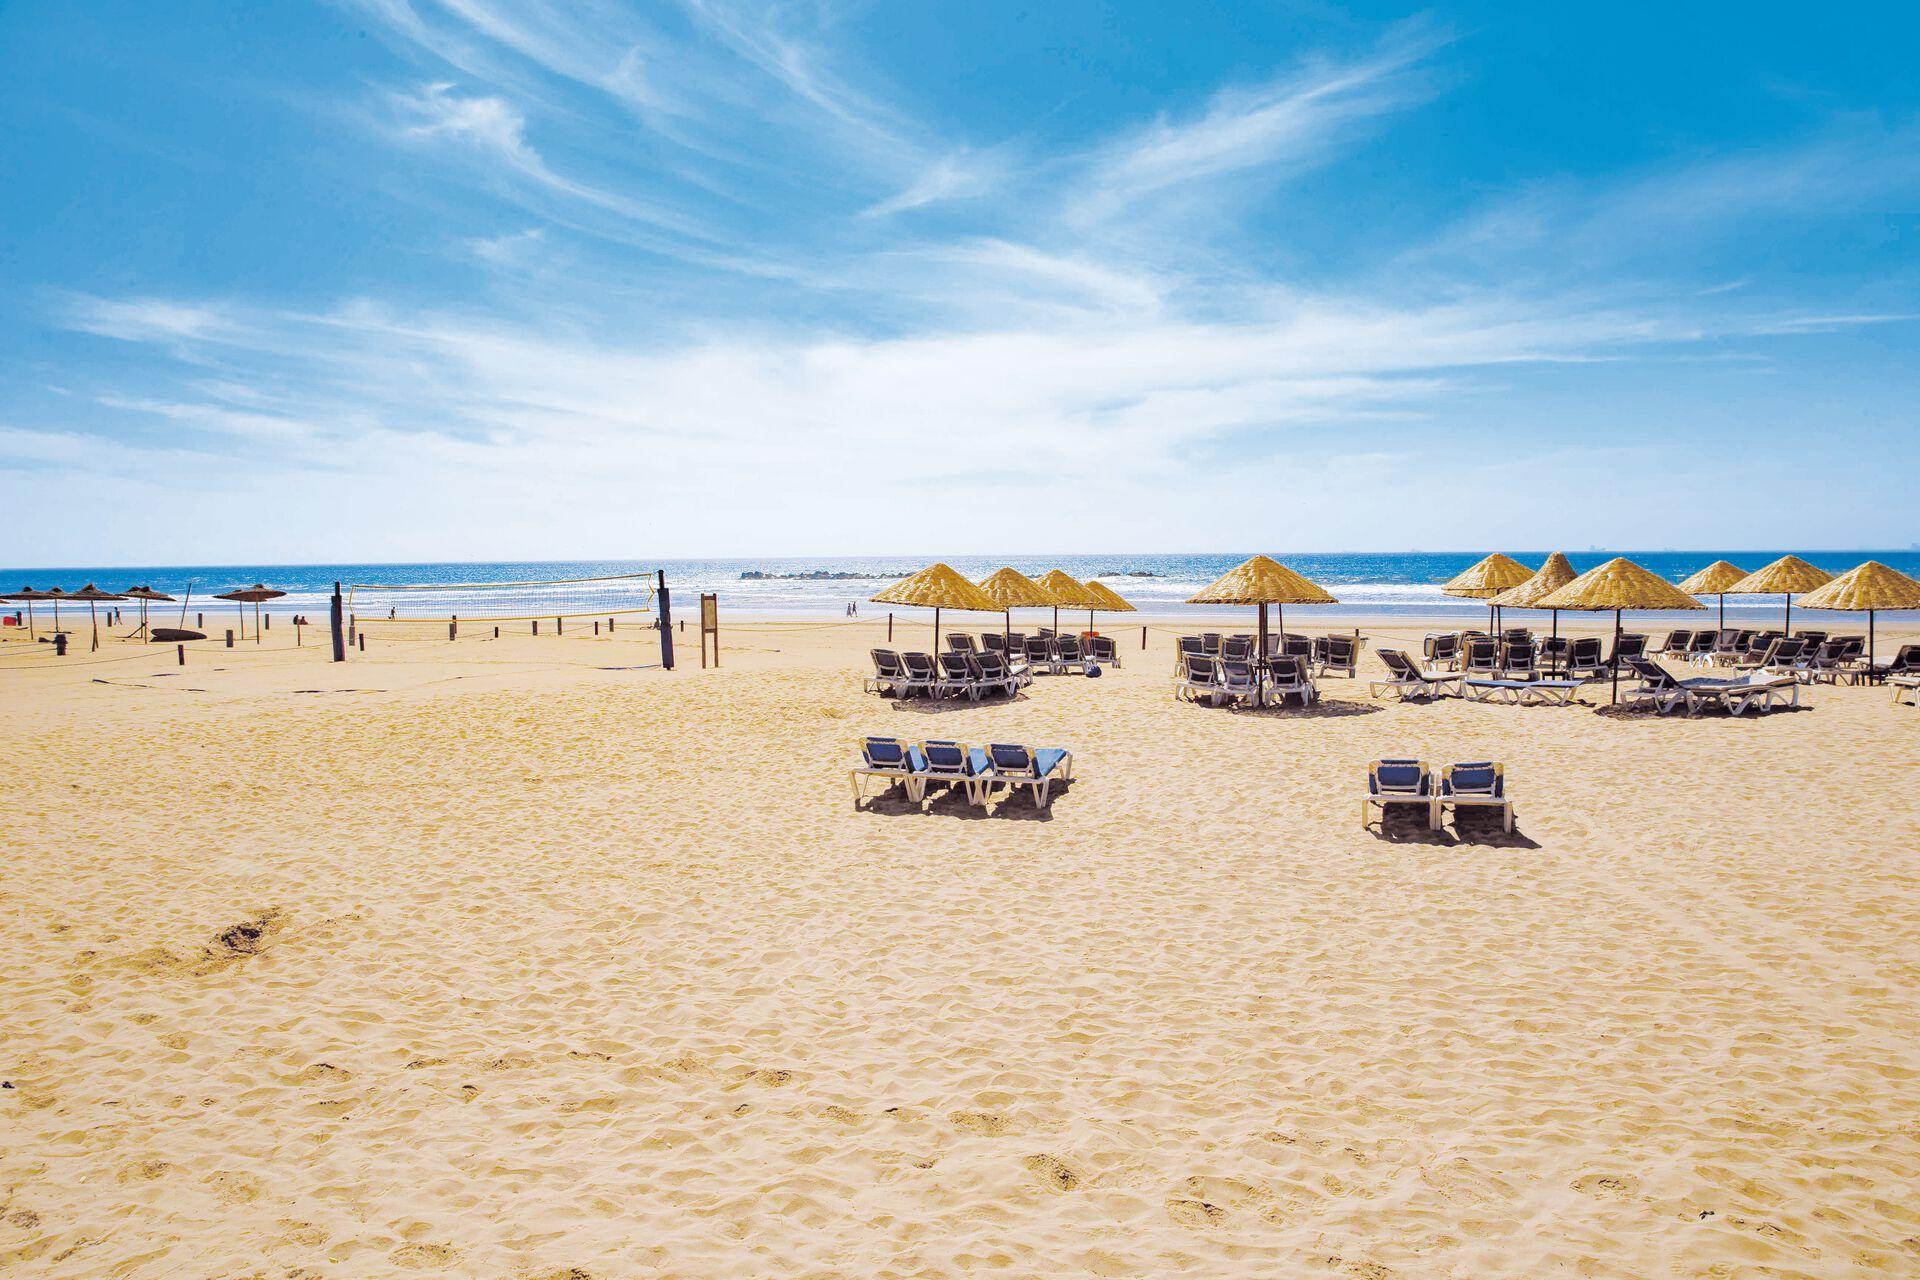 Maroc - Agadir - Club FTI Voyages Les Dunes d'Or 4*